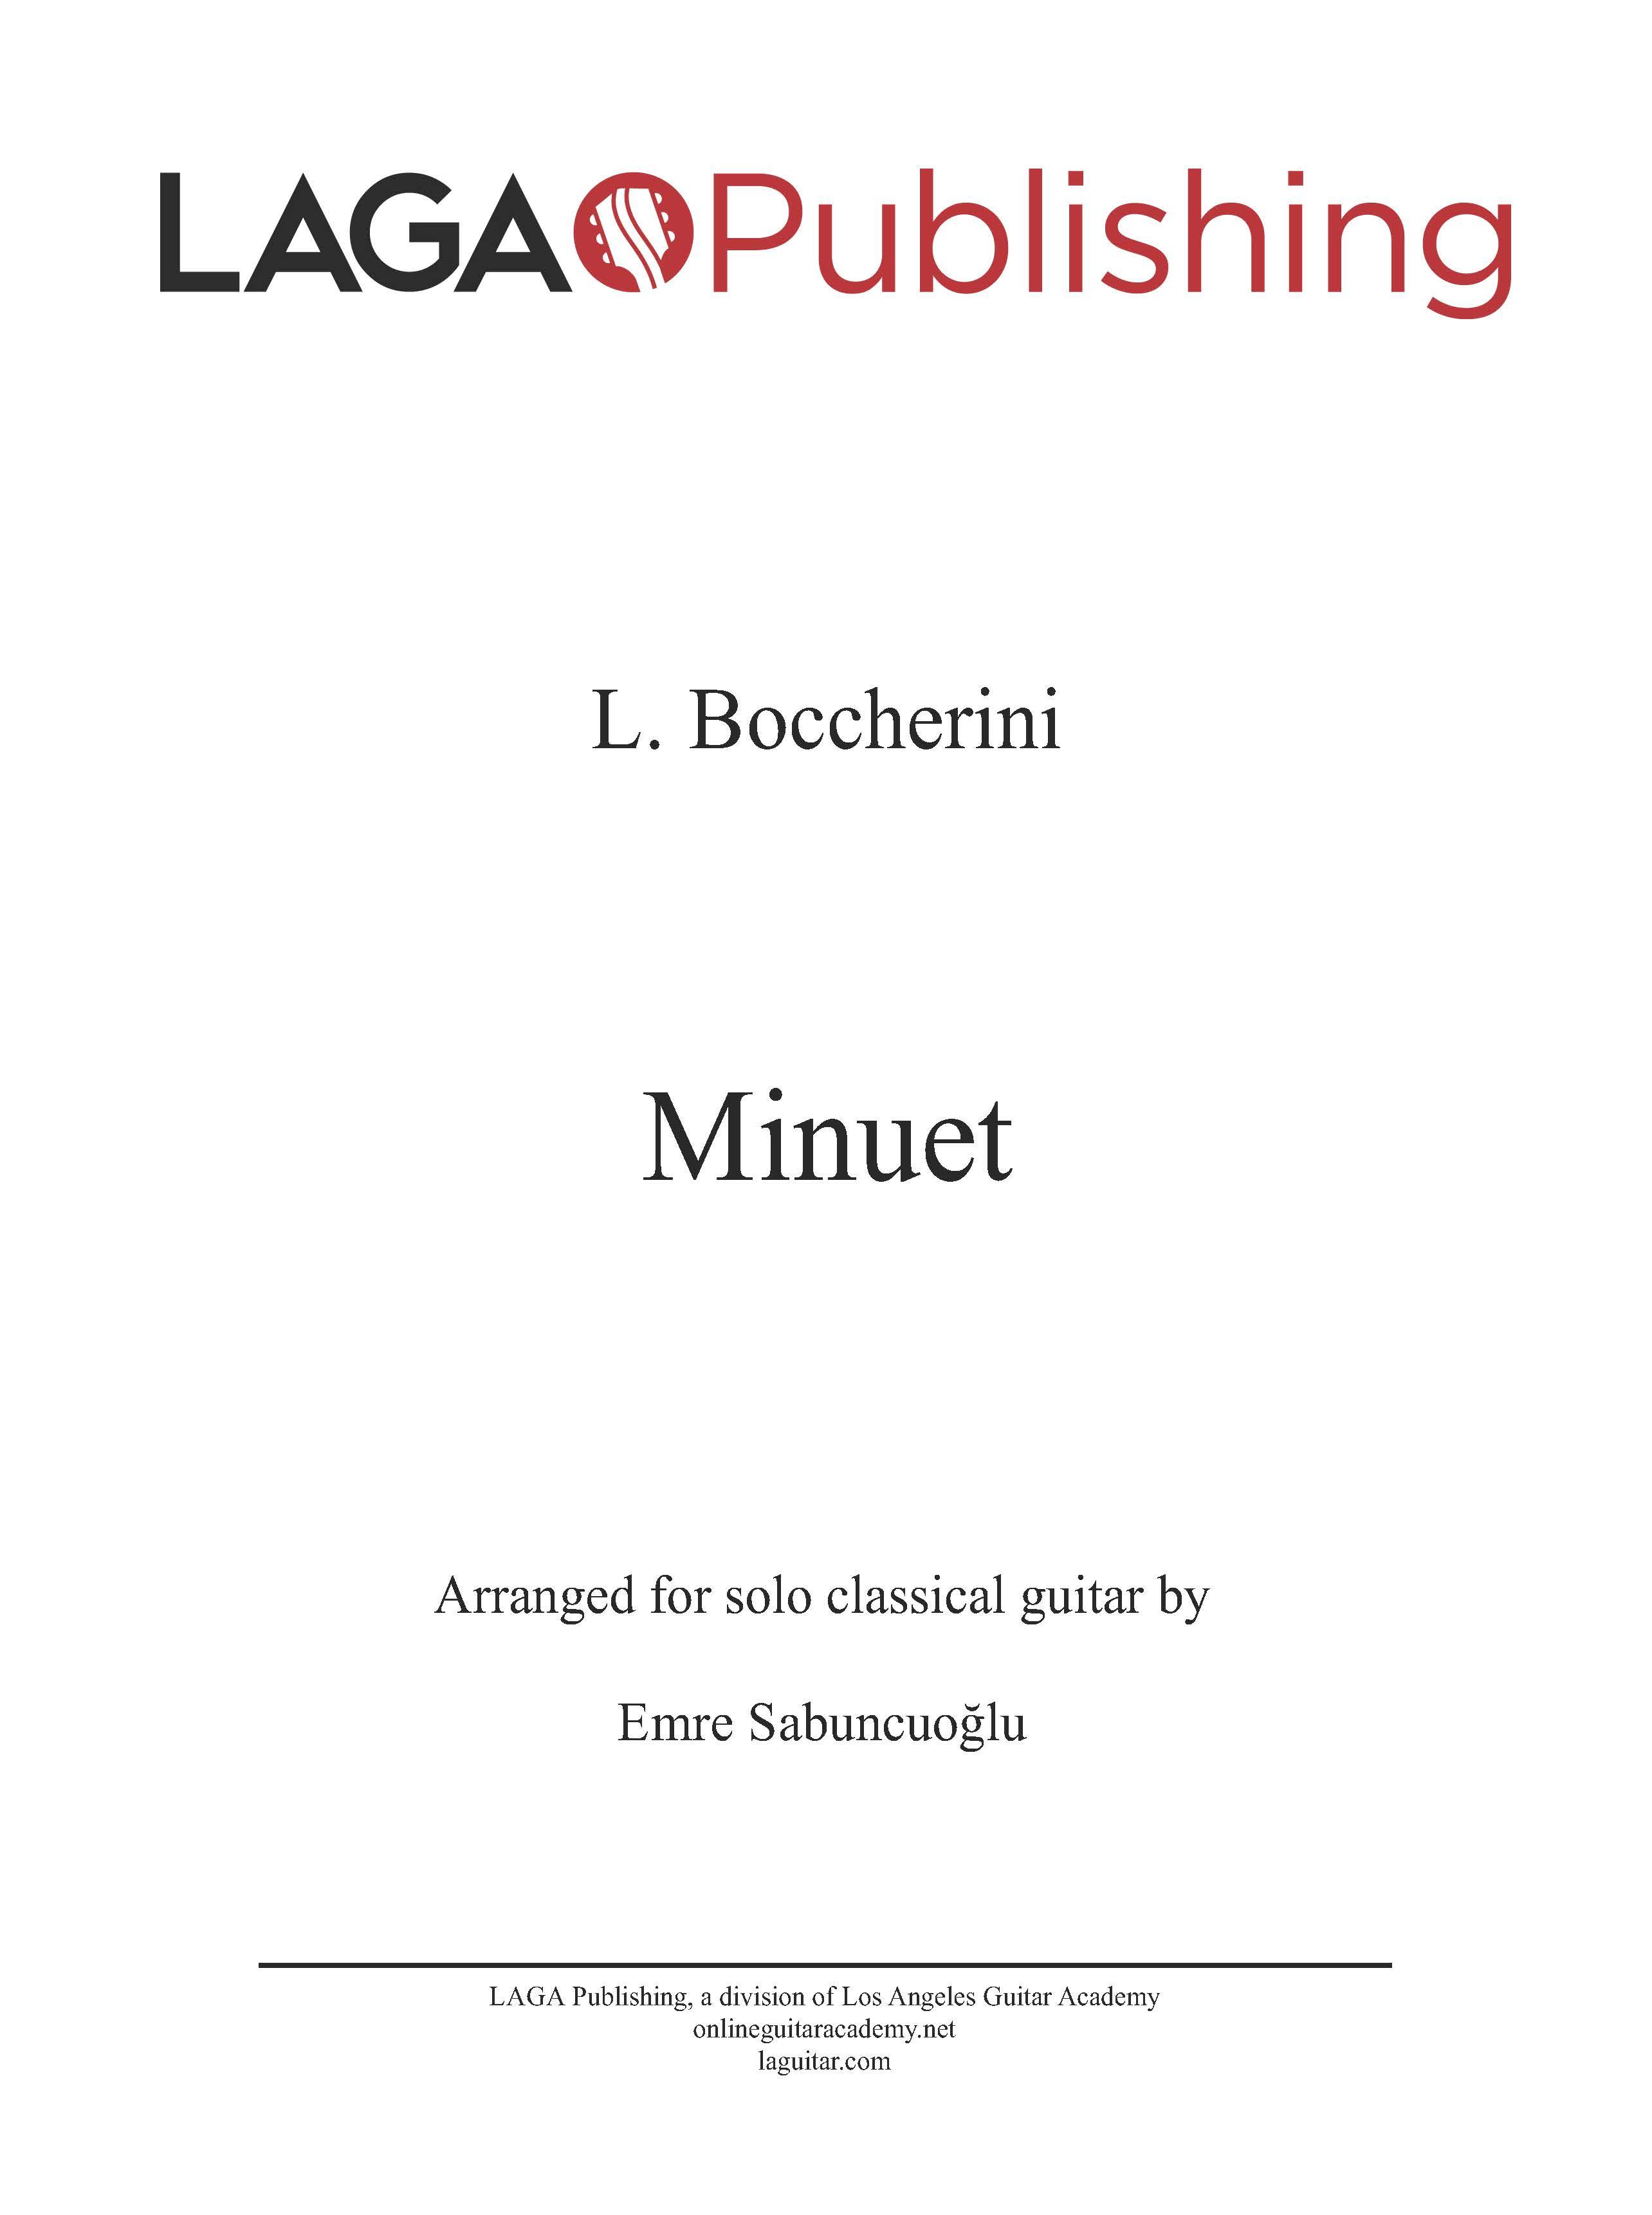 LAGA-Publishing-Boccherini-Minuet-Score-and-Tab